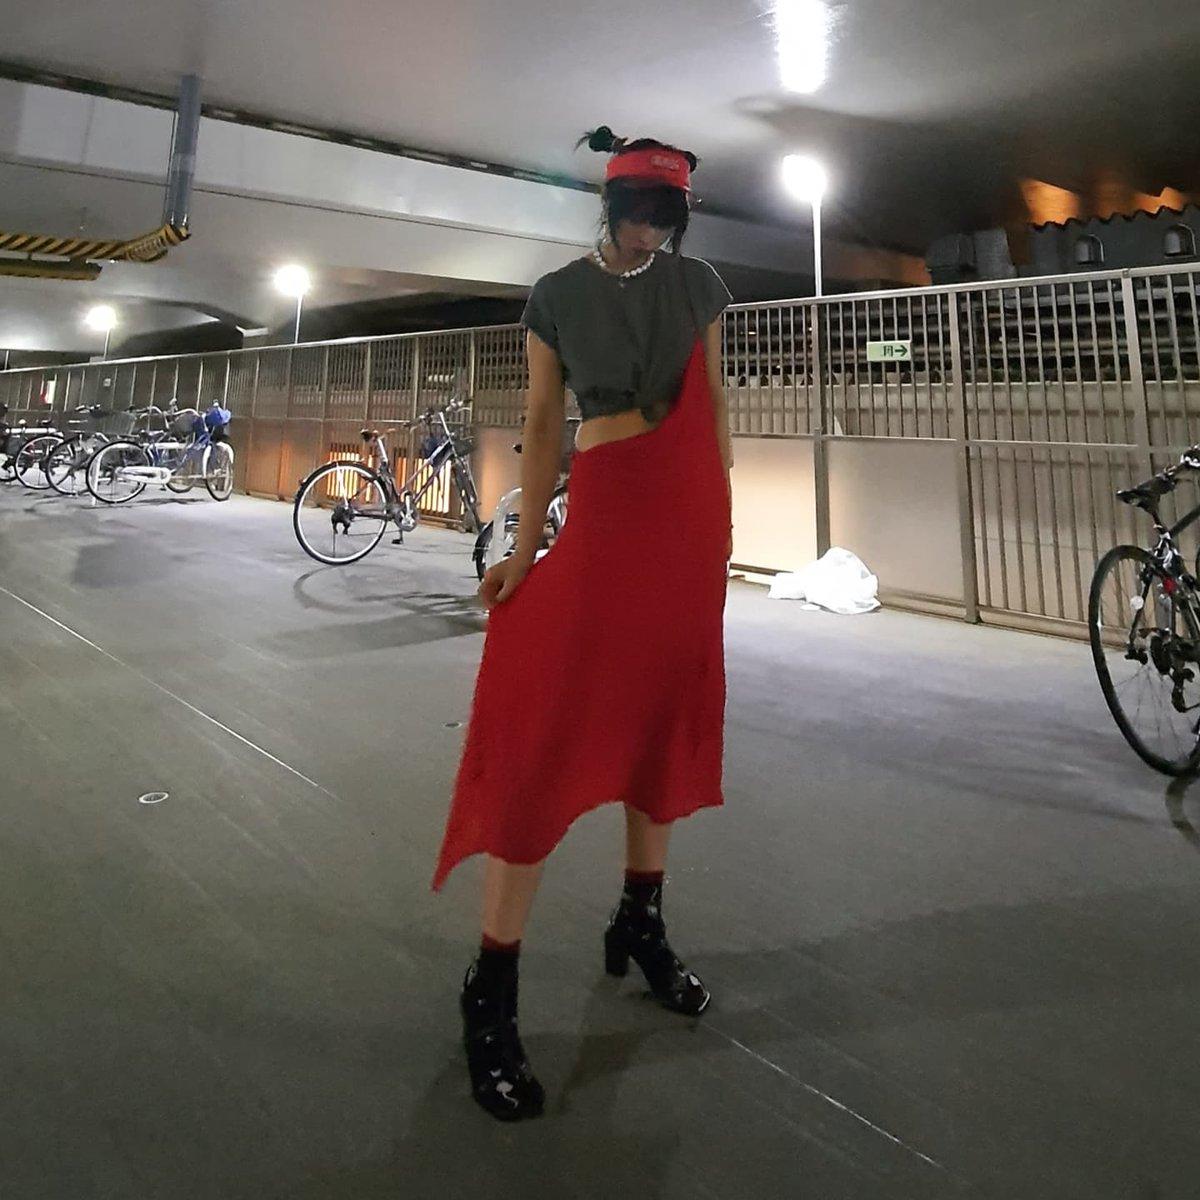 I love red especially in Yohjis ❤️  #ootd #yohjiyamamoto #openthedoor #alternativegirl #alternativestyle #jfashion https://t.co/9wzWNb932r